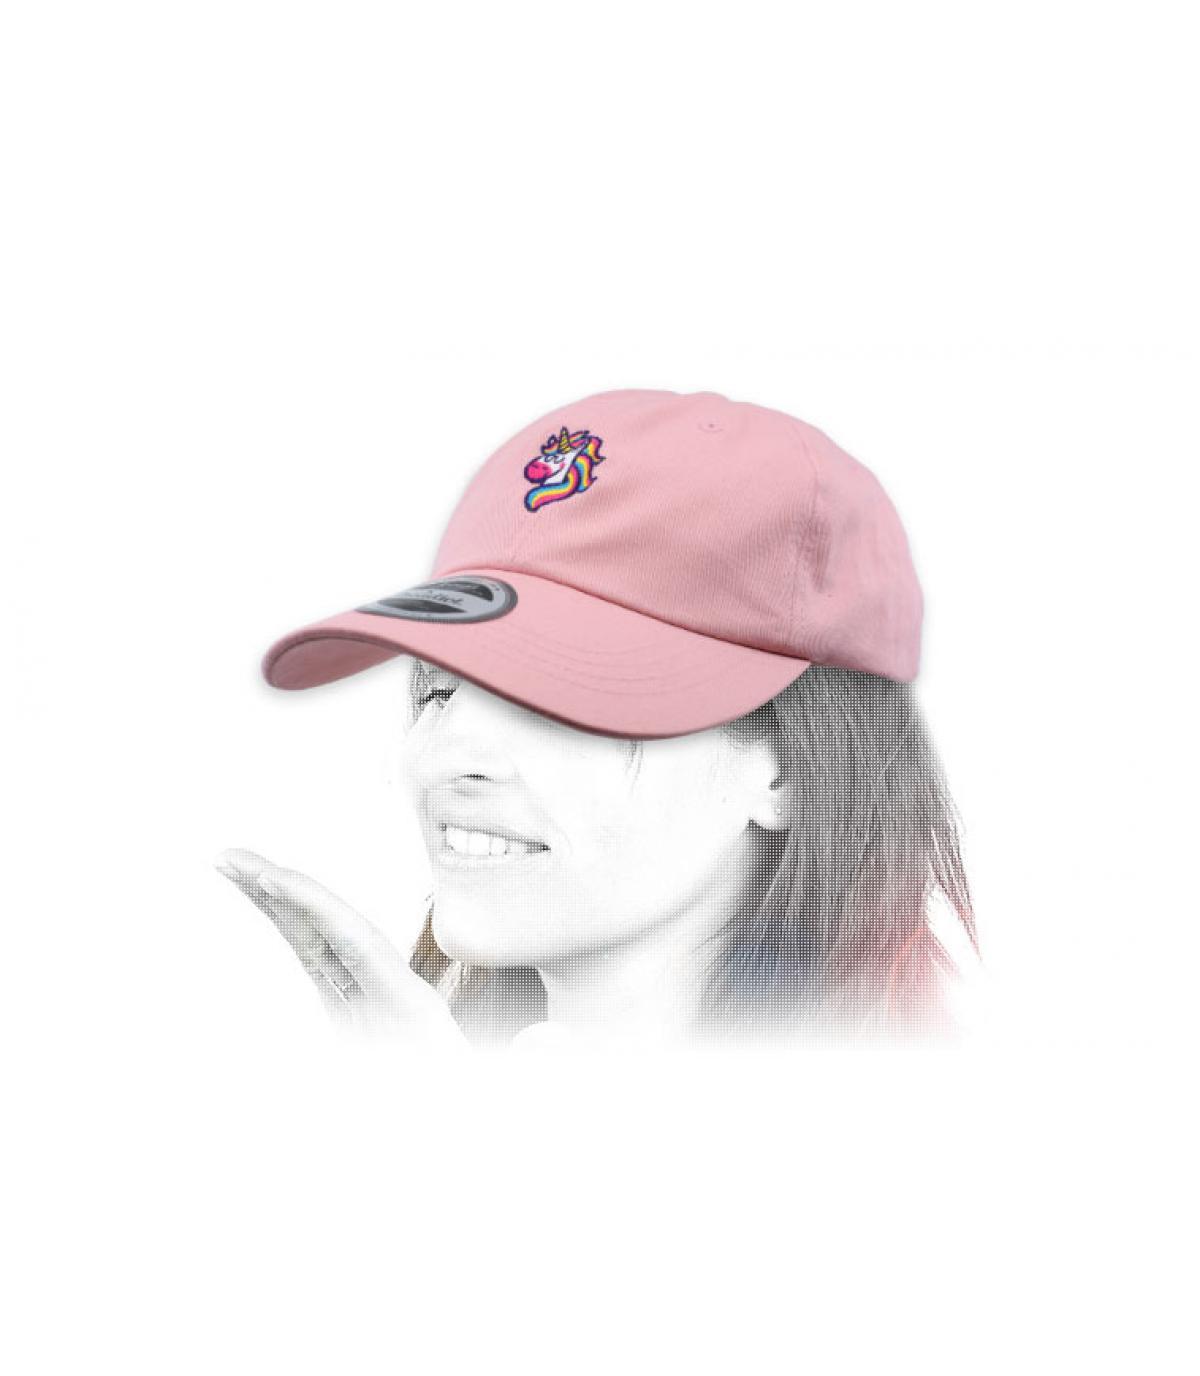 gorra unicornio rosa